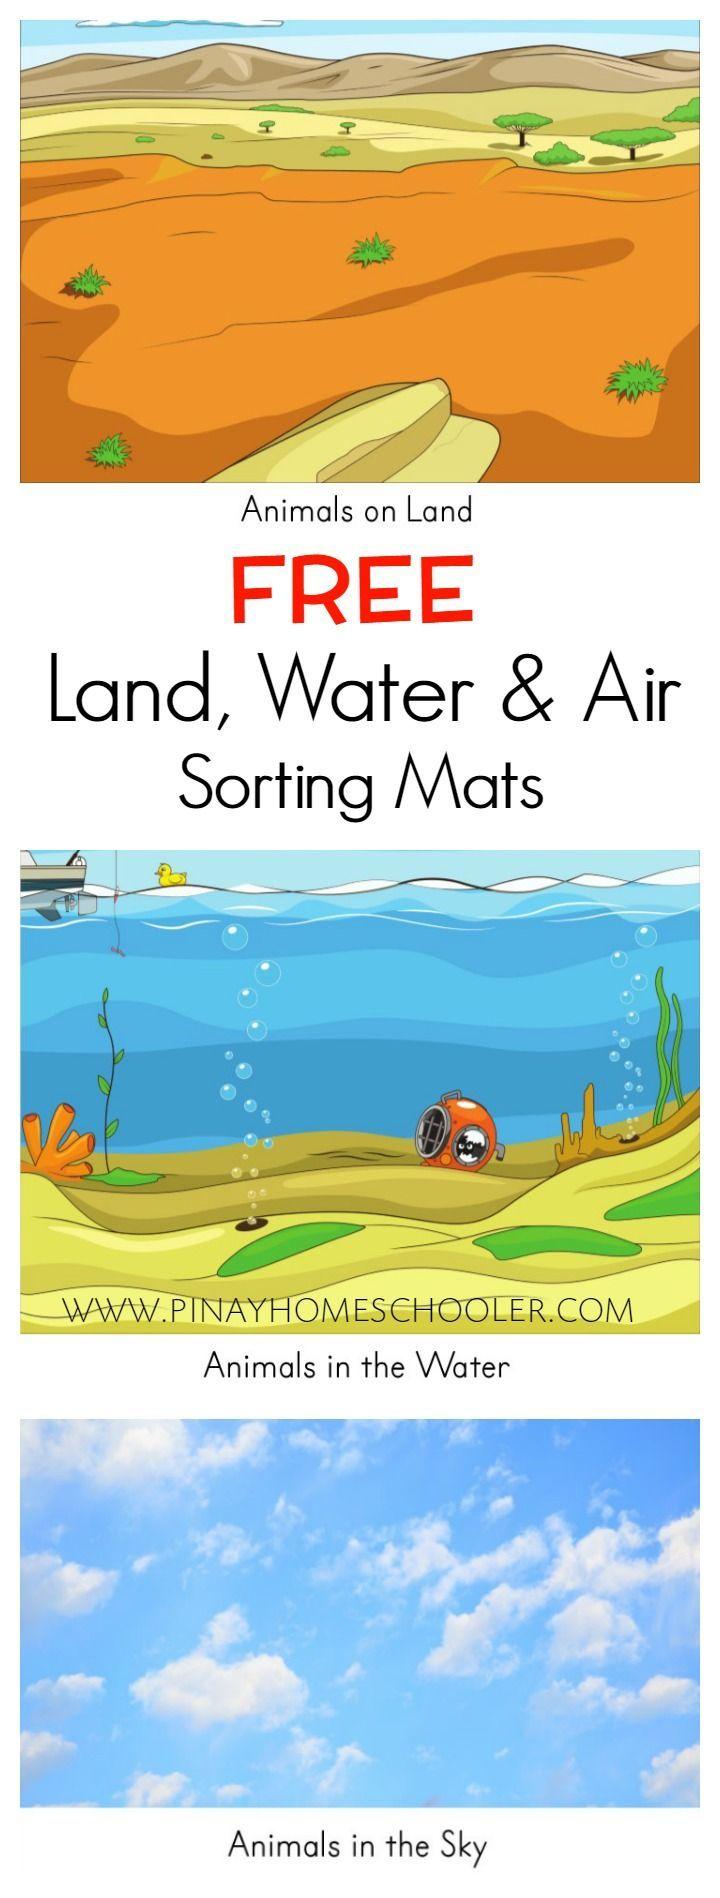 FREE Land Water and Air Sorting Mats Water animals